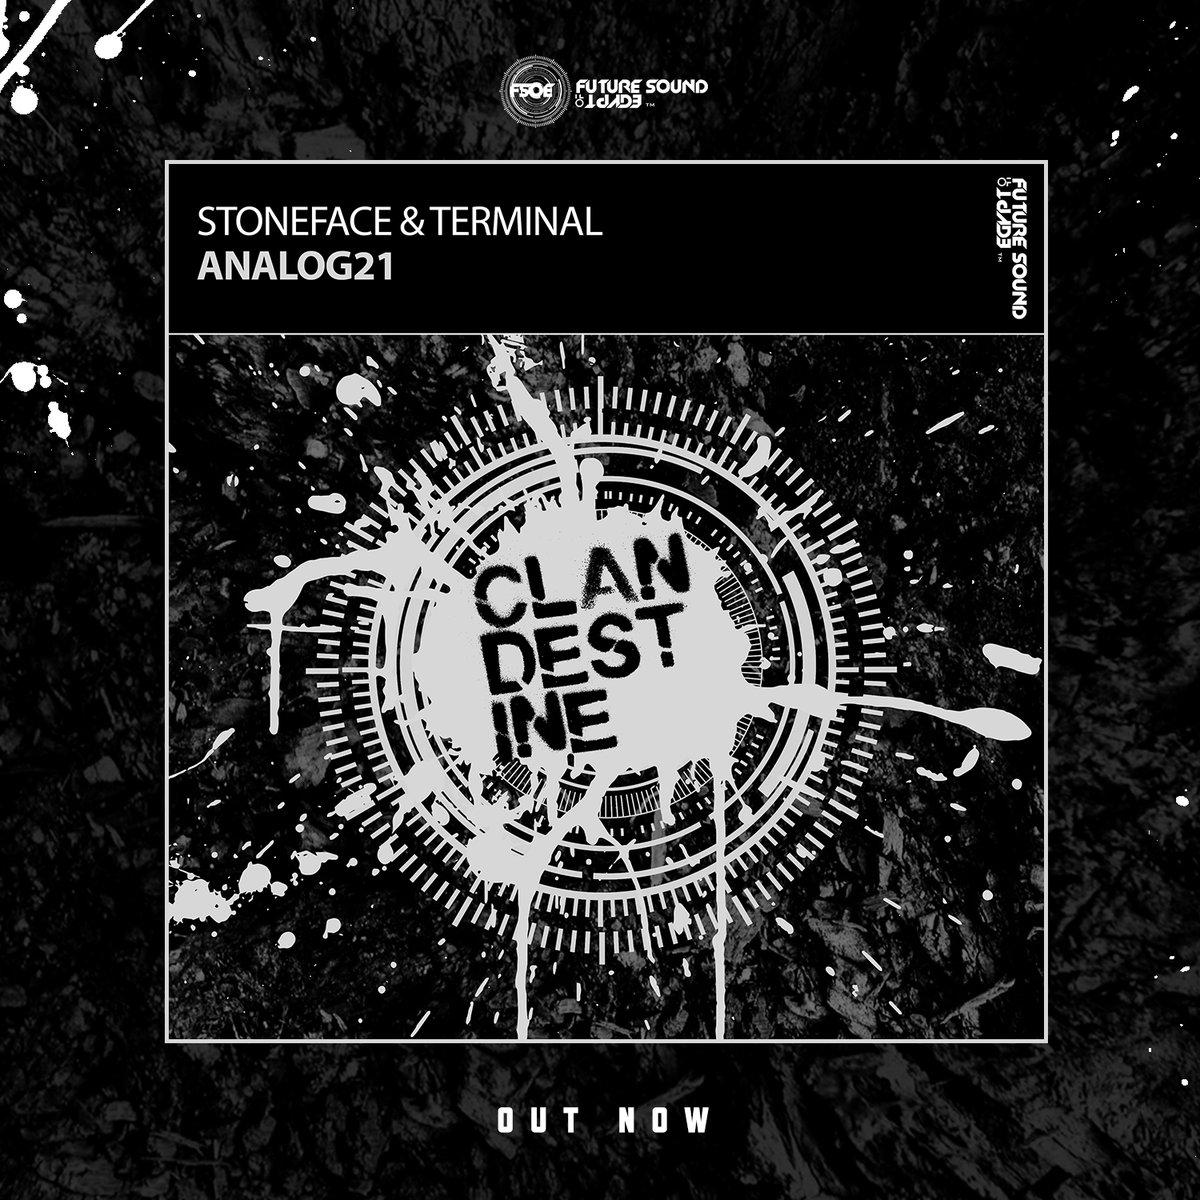 Stoneface & Terminal - Analog21